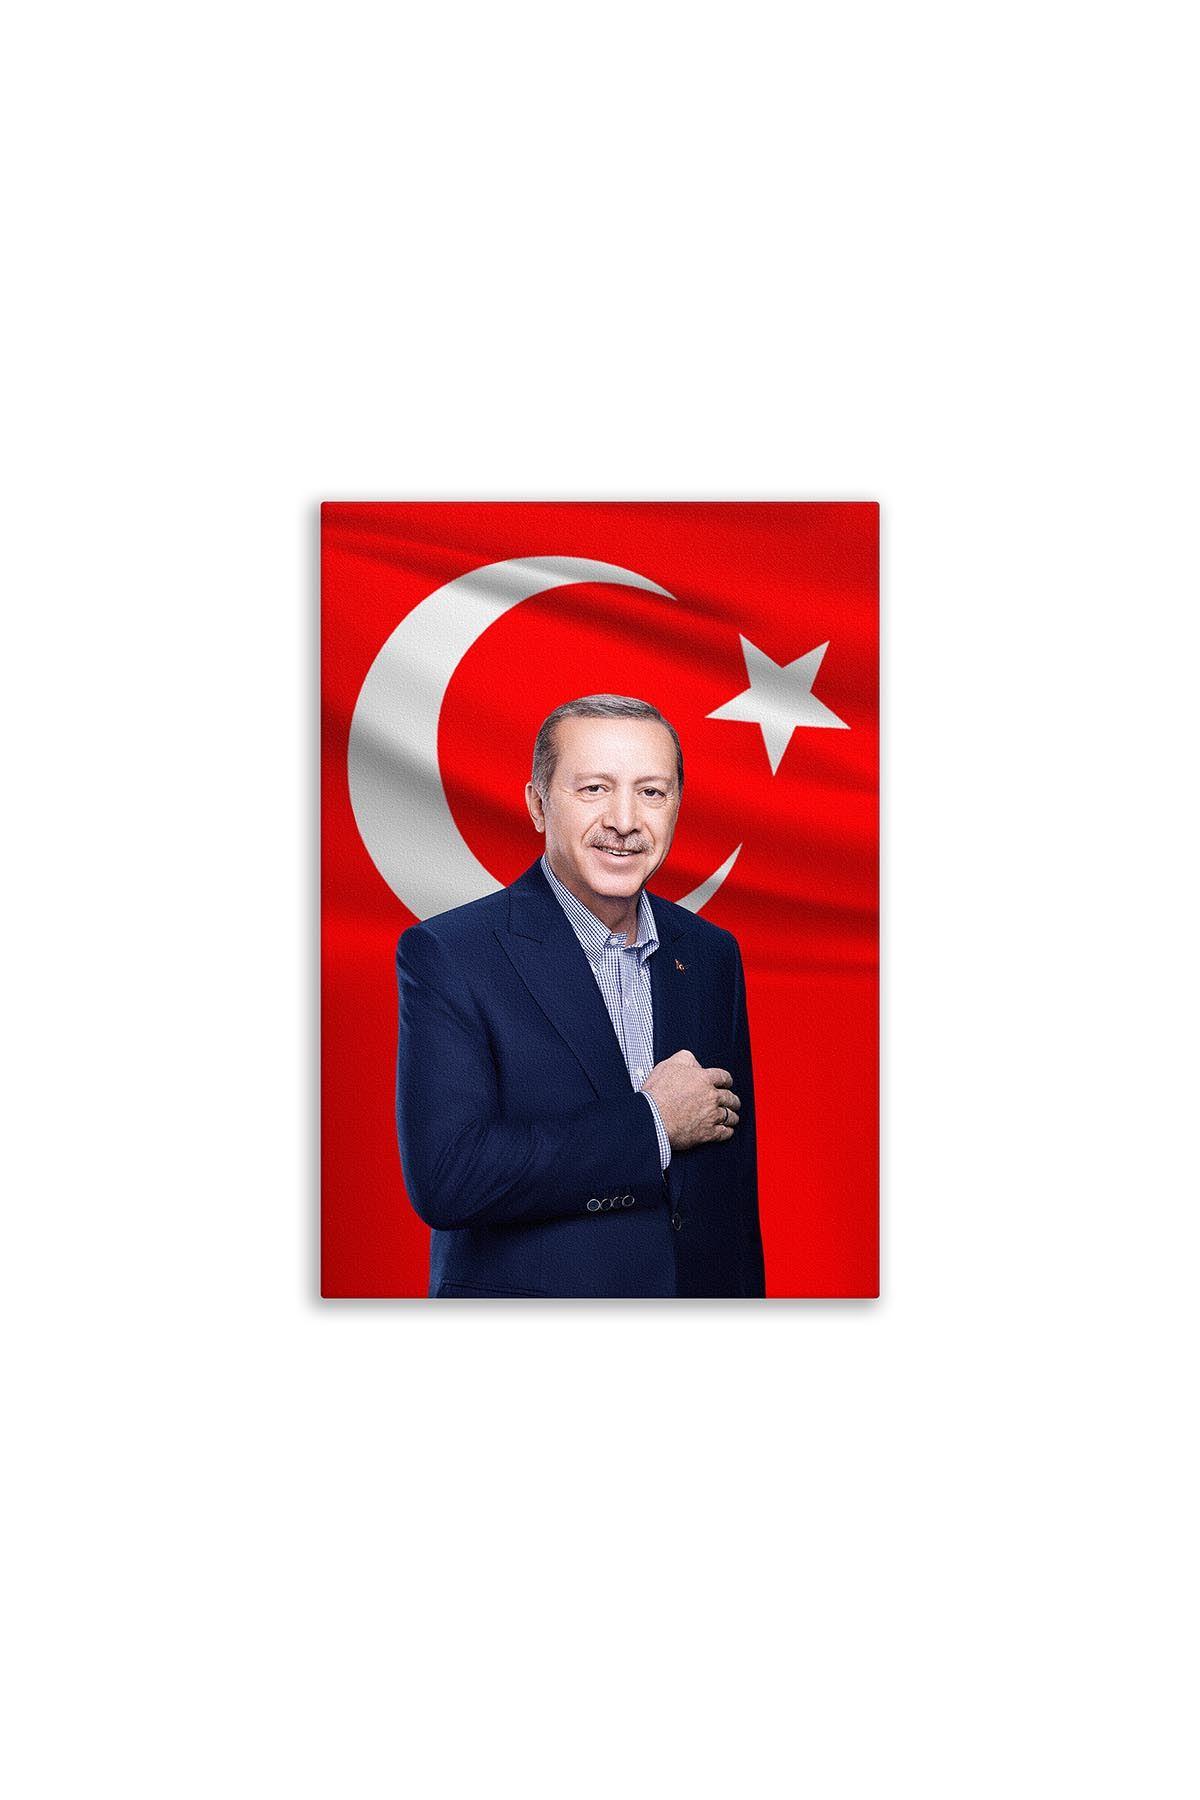 Turkish President Canvas Board | Printed Canvas Board | Customized Canvas Board